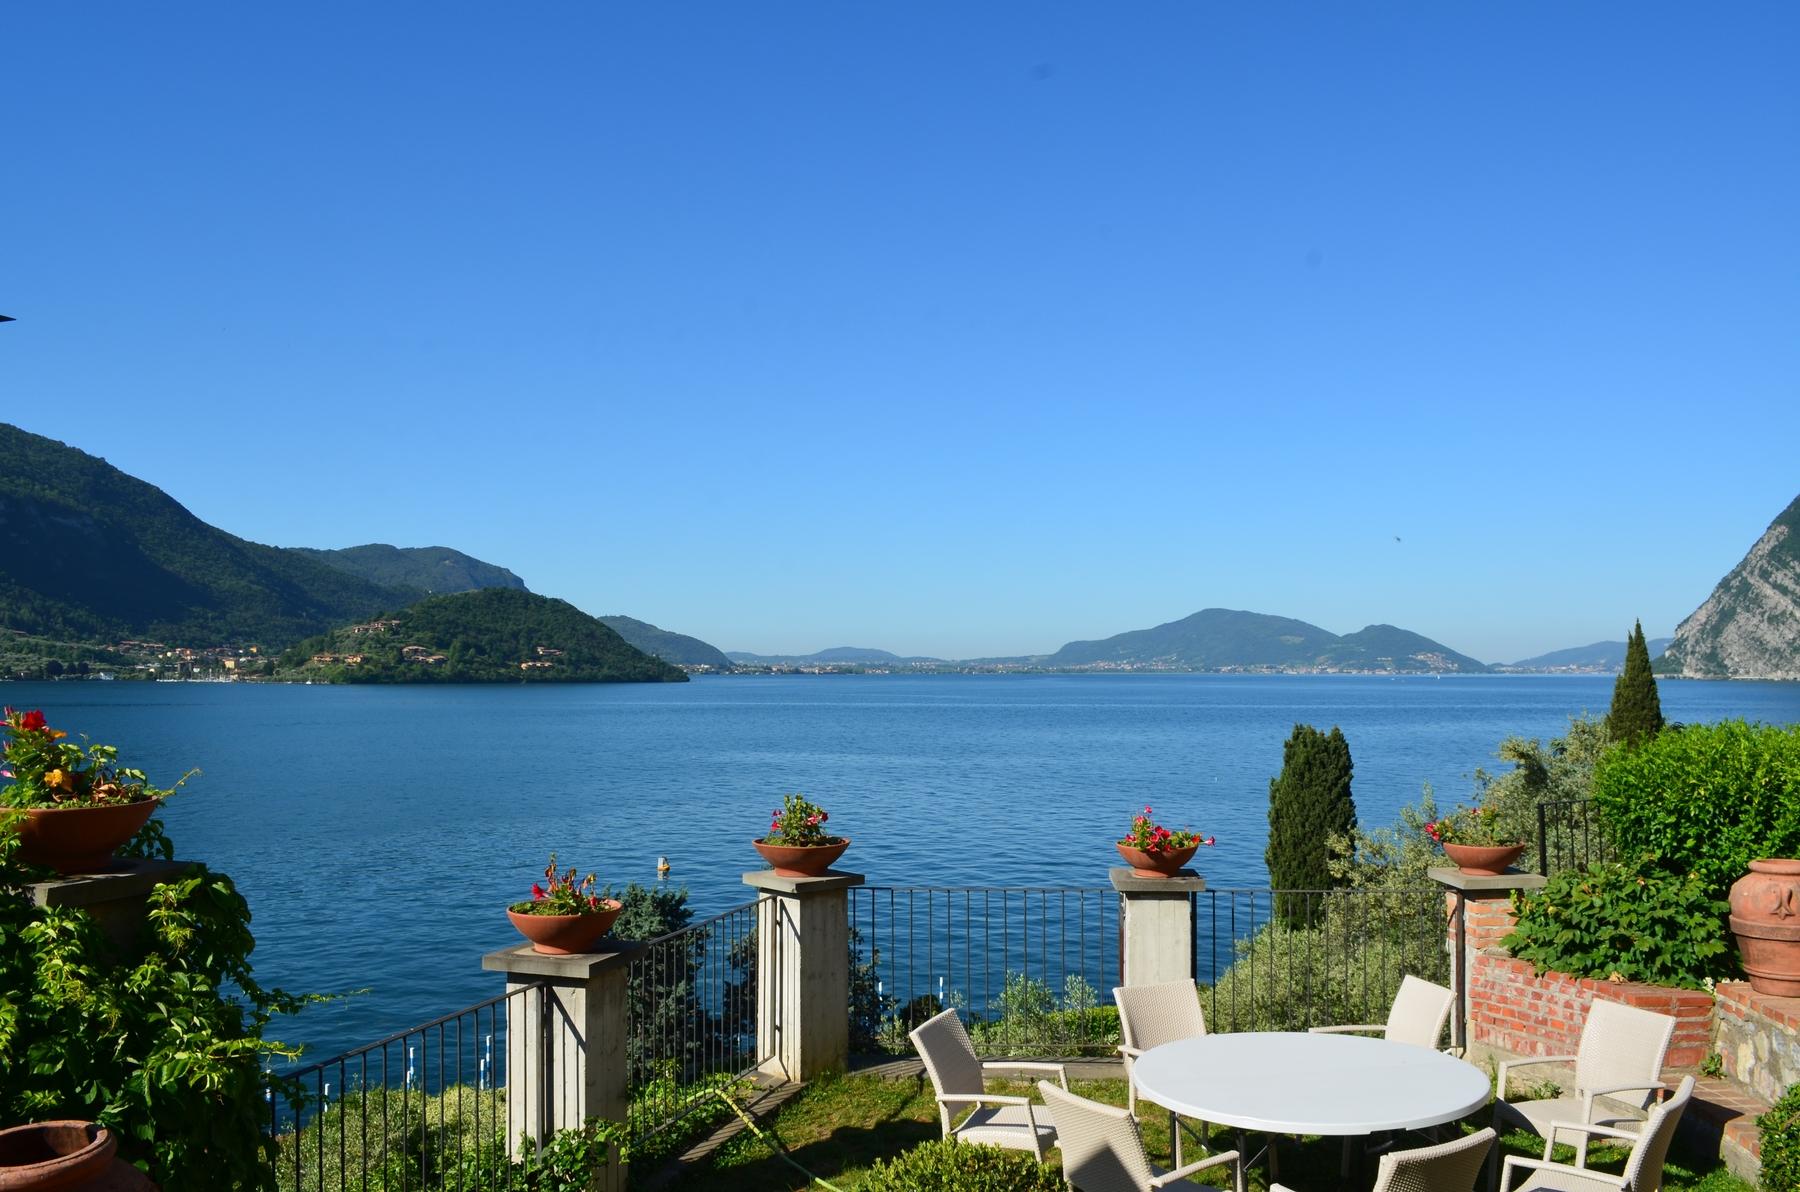 laghi in italia